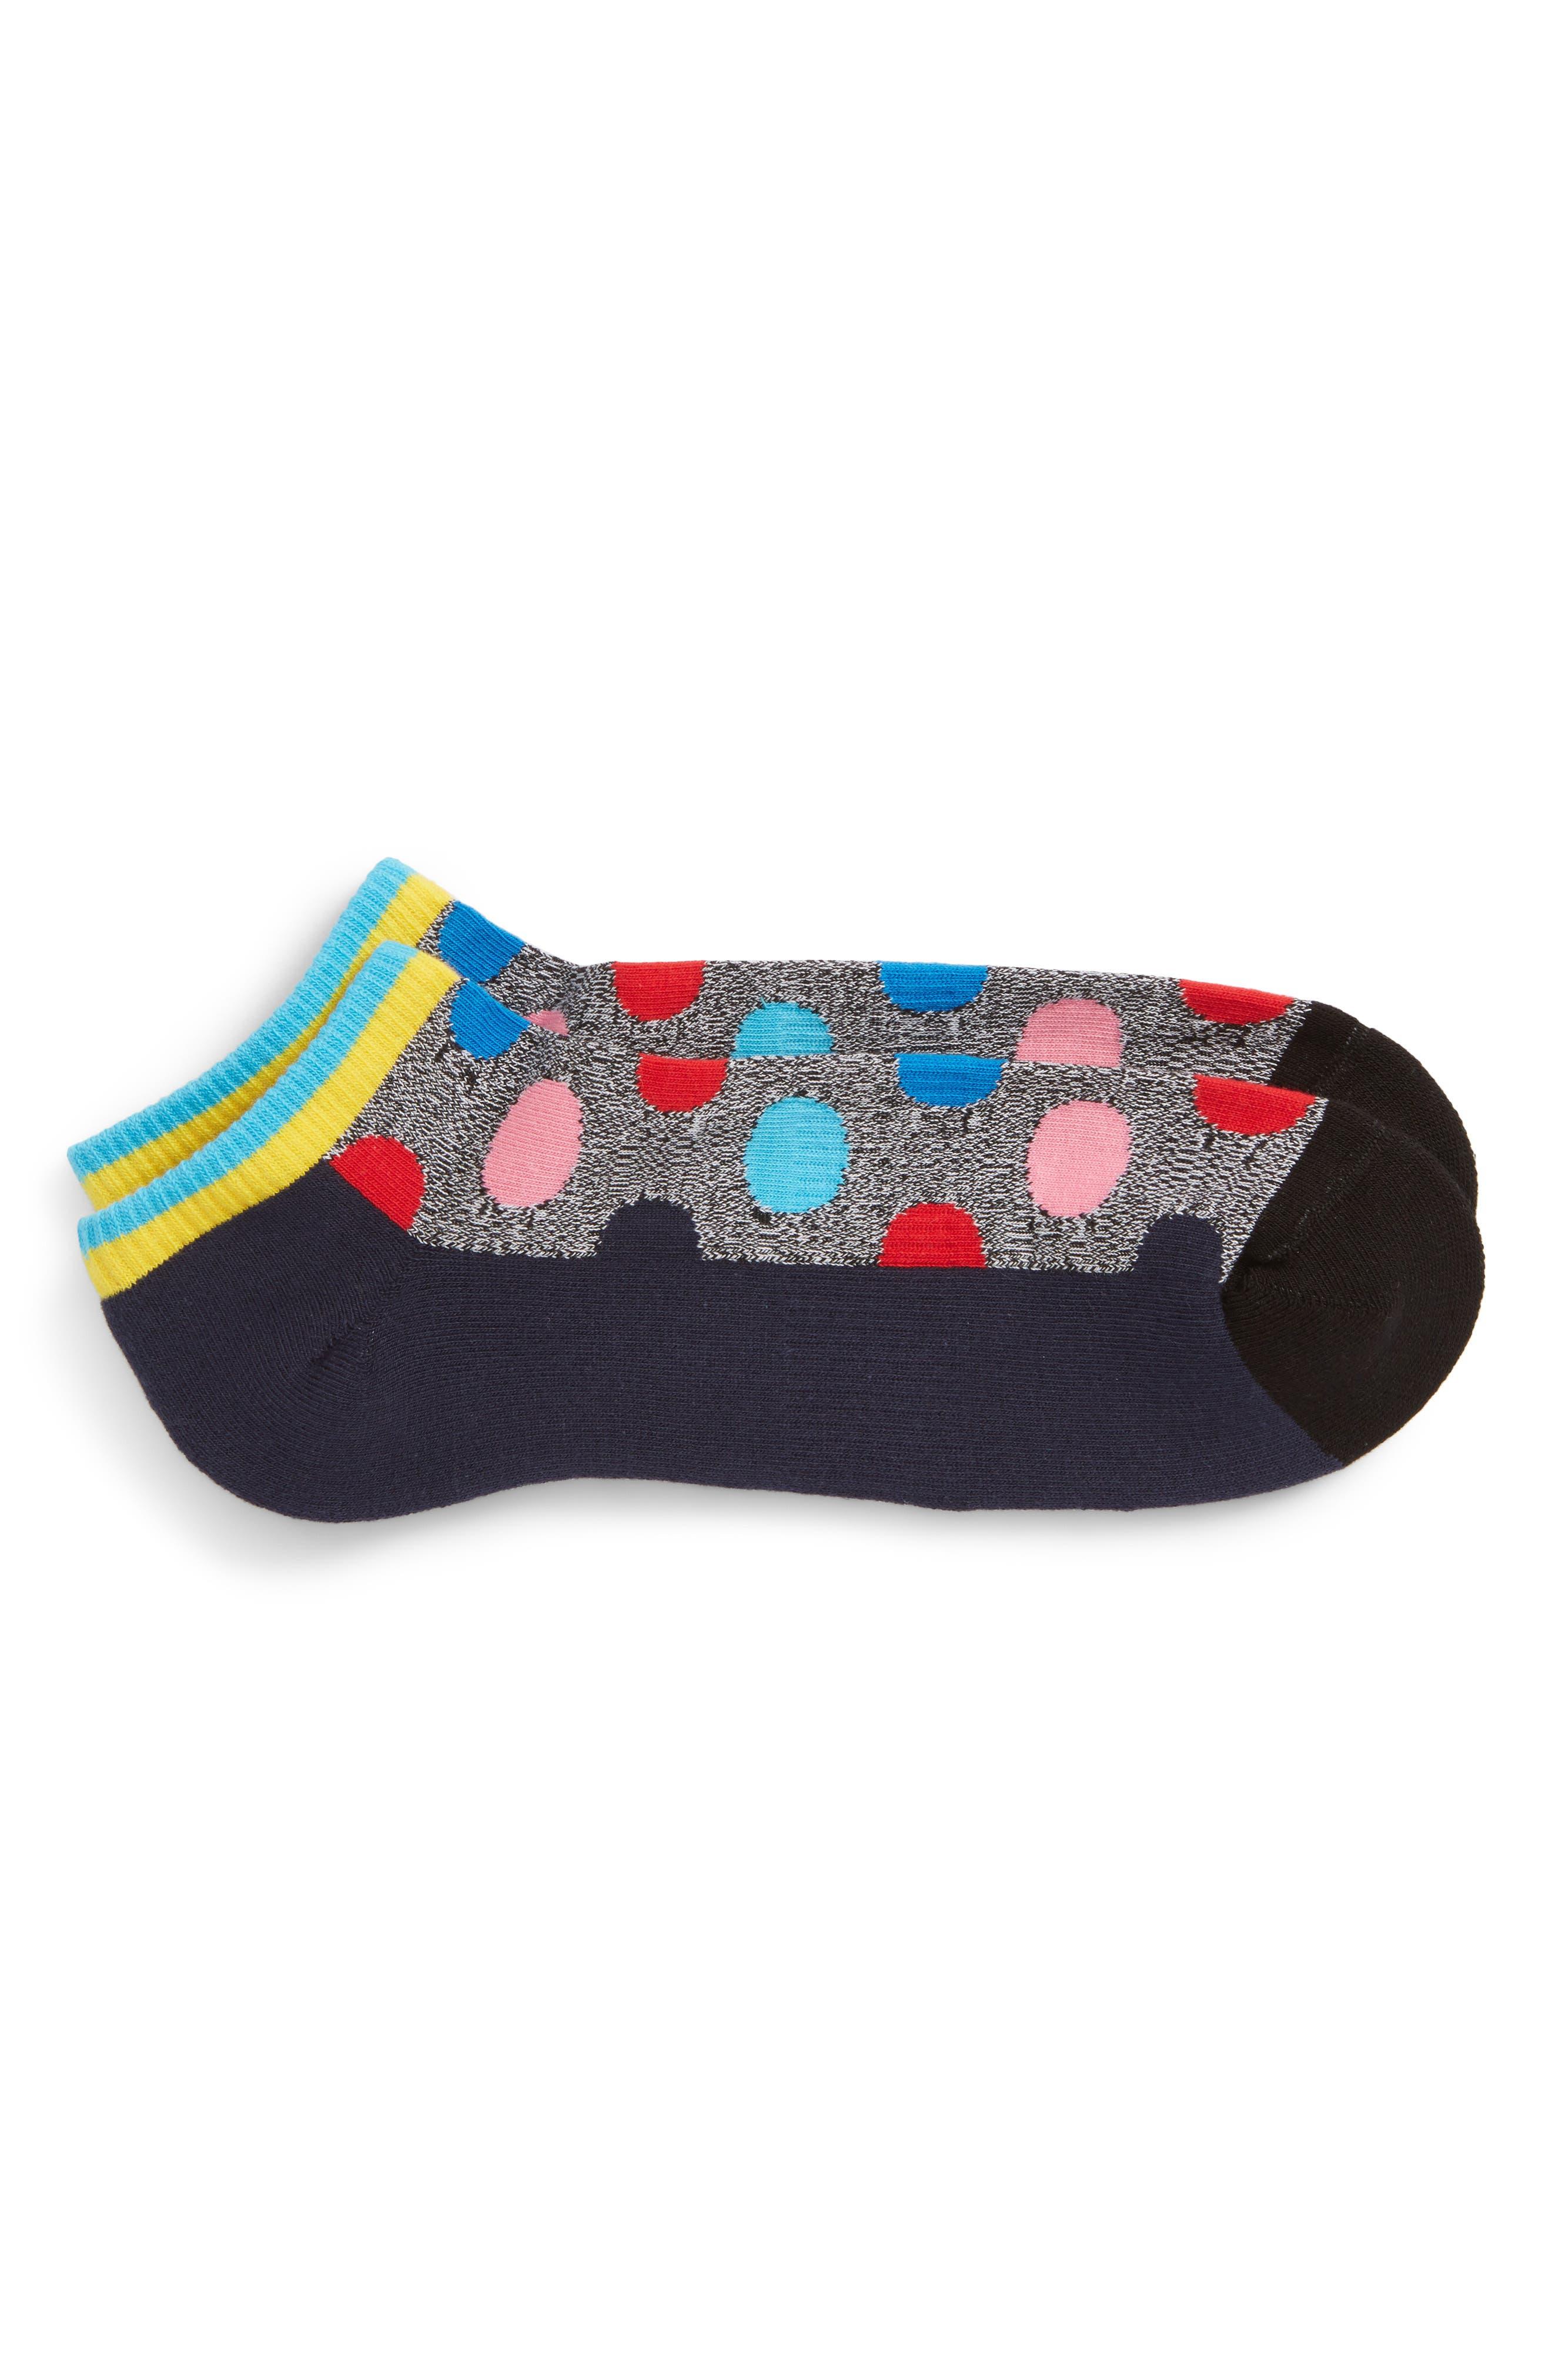 Big Dot Low Cut Socks,                         Main,                         color, 060